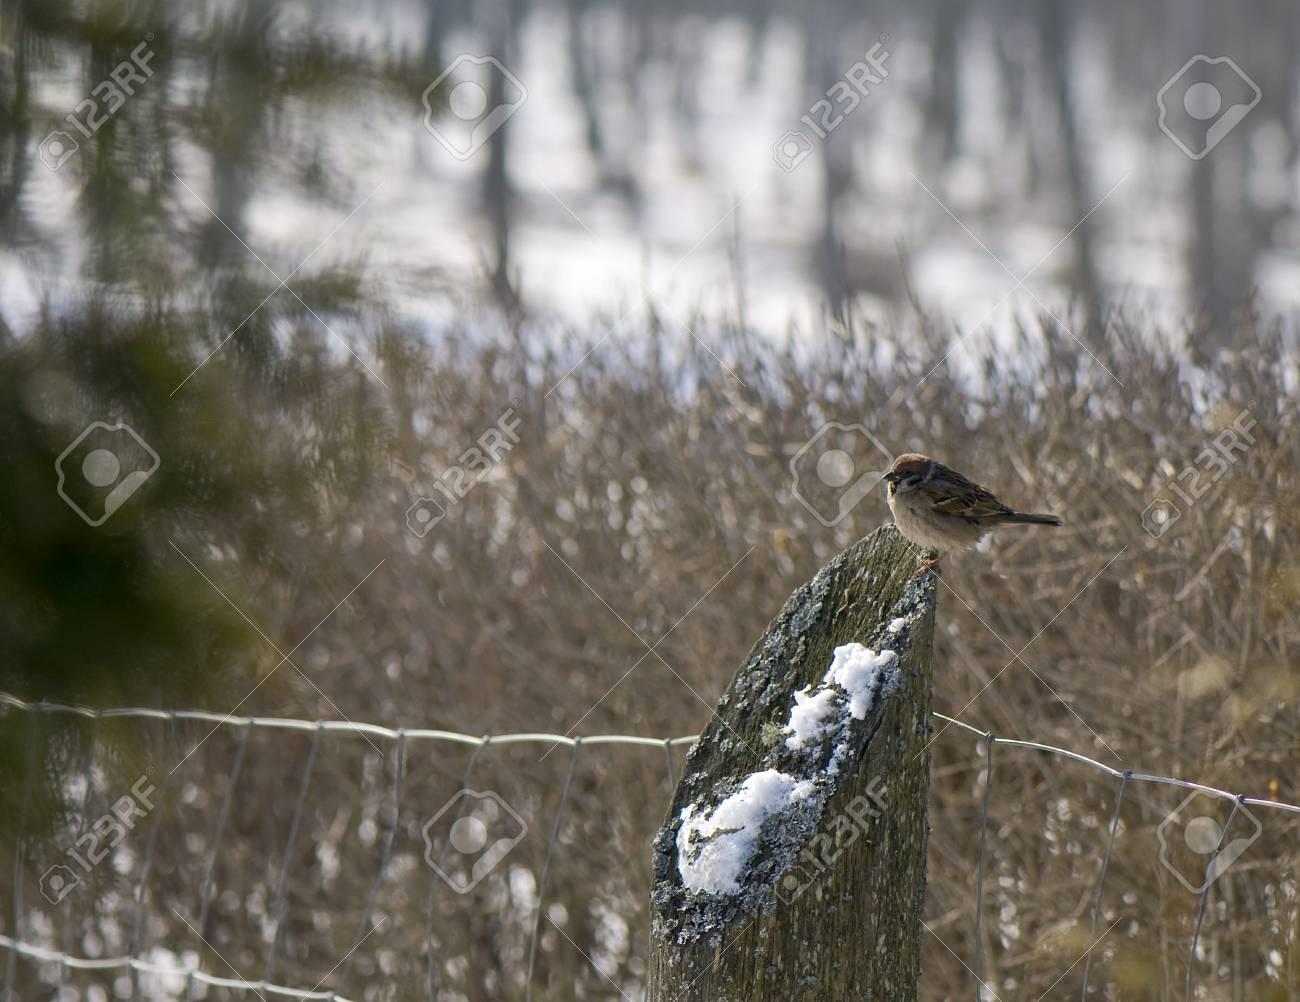 Sparrow tree sparrow, grasshopper sparrow, Passer, montanus Stock Photo - 8969041